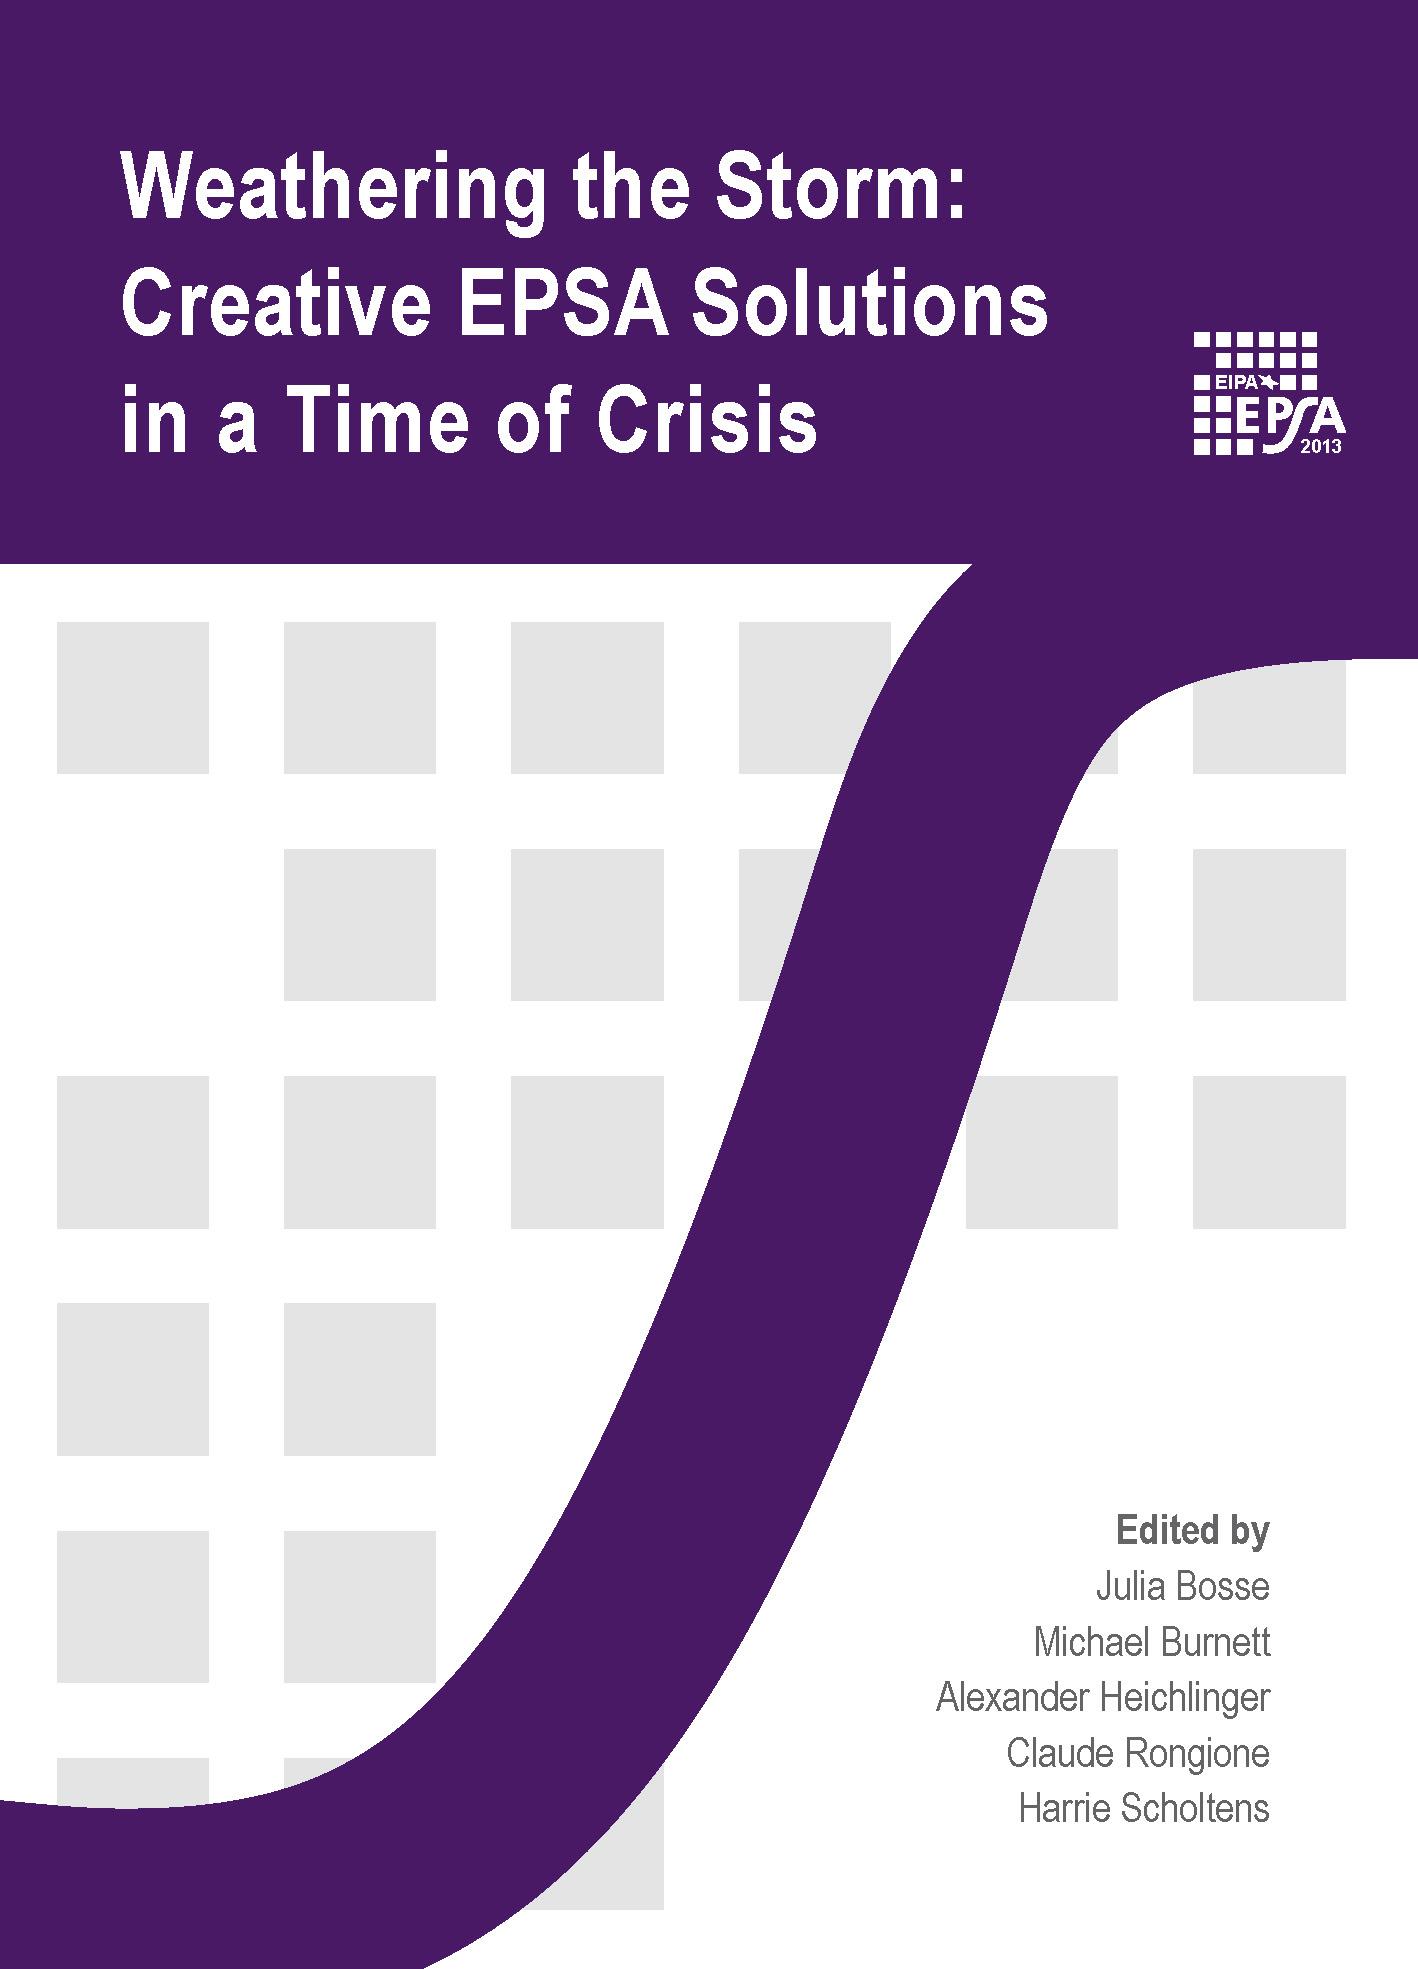 EPSA 2013 publication